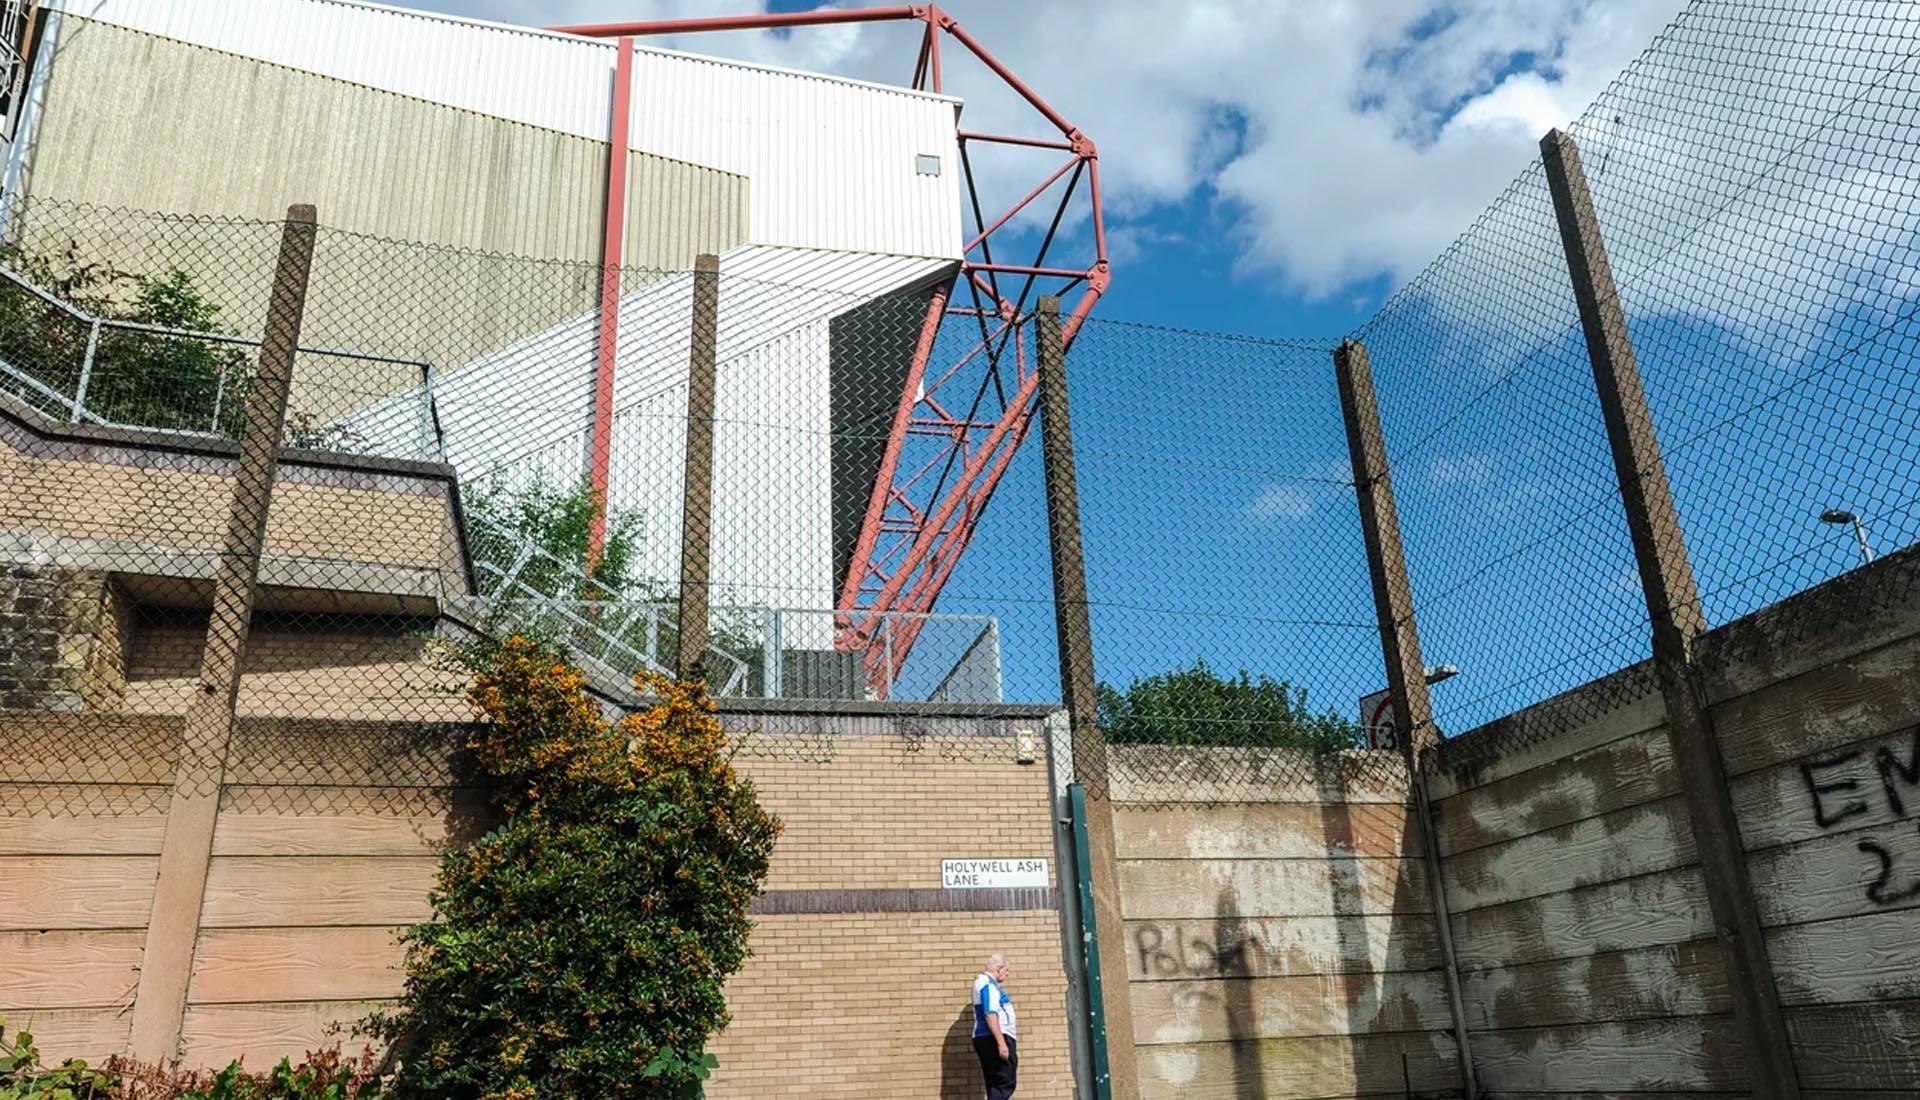 Английский чемпионат Лига 1 Брэдфорд Сити - Бристоль Роверс - Stone Forest